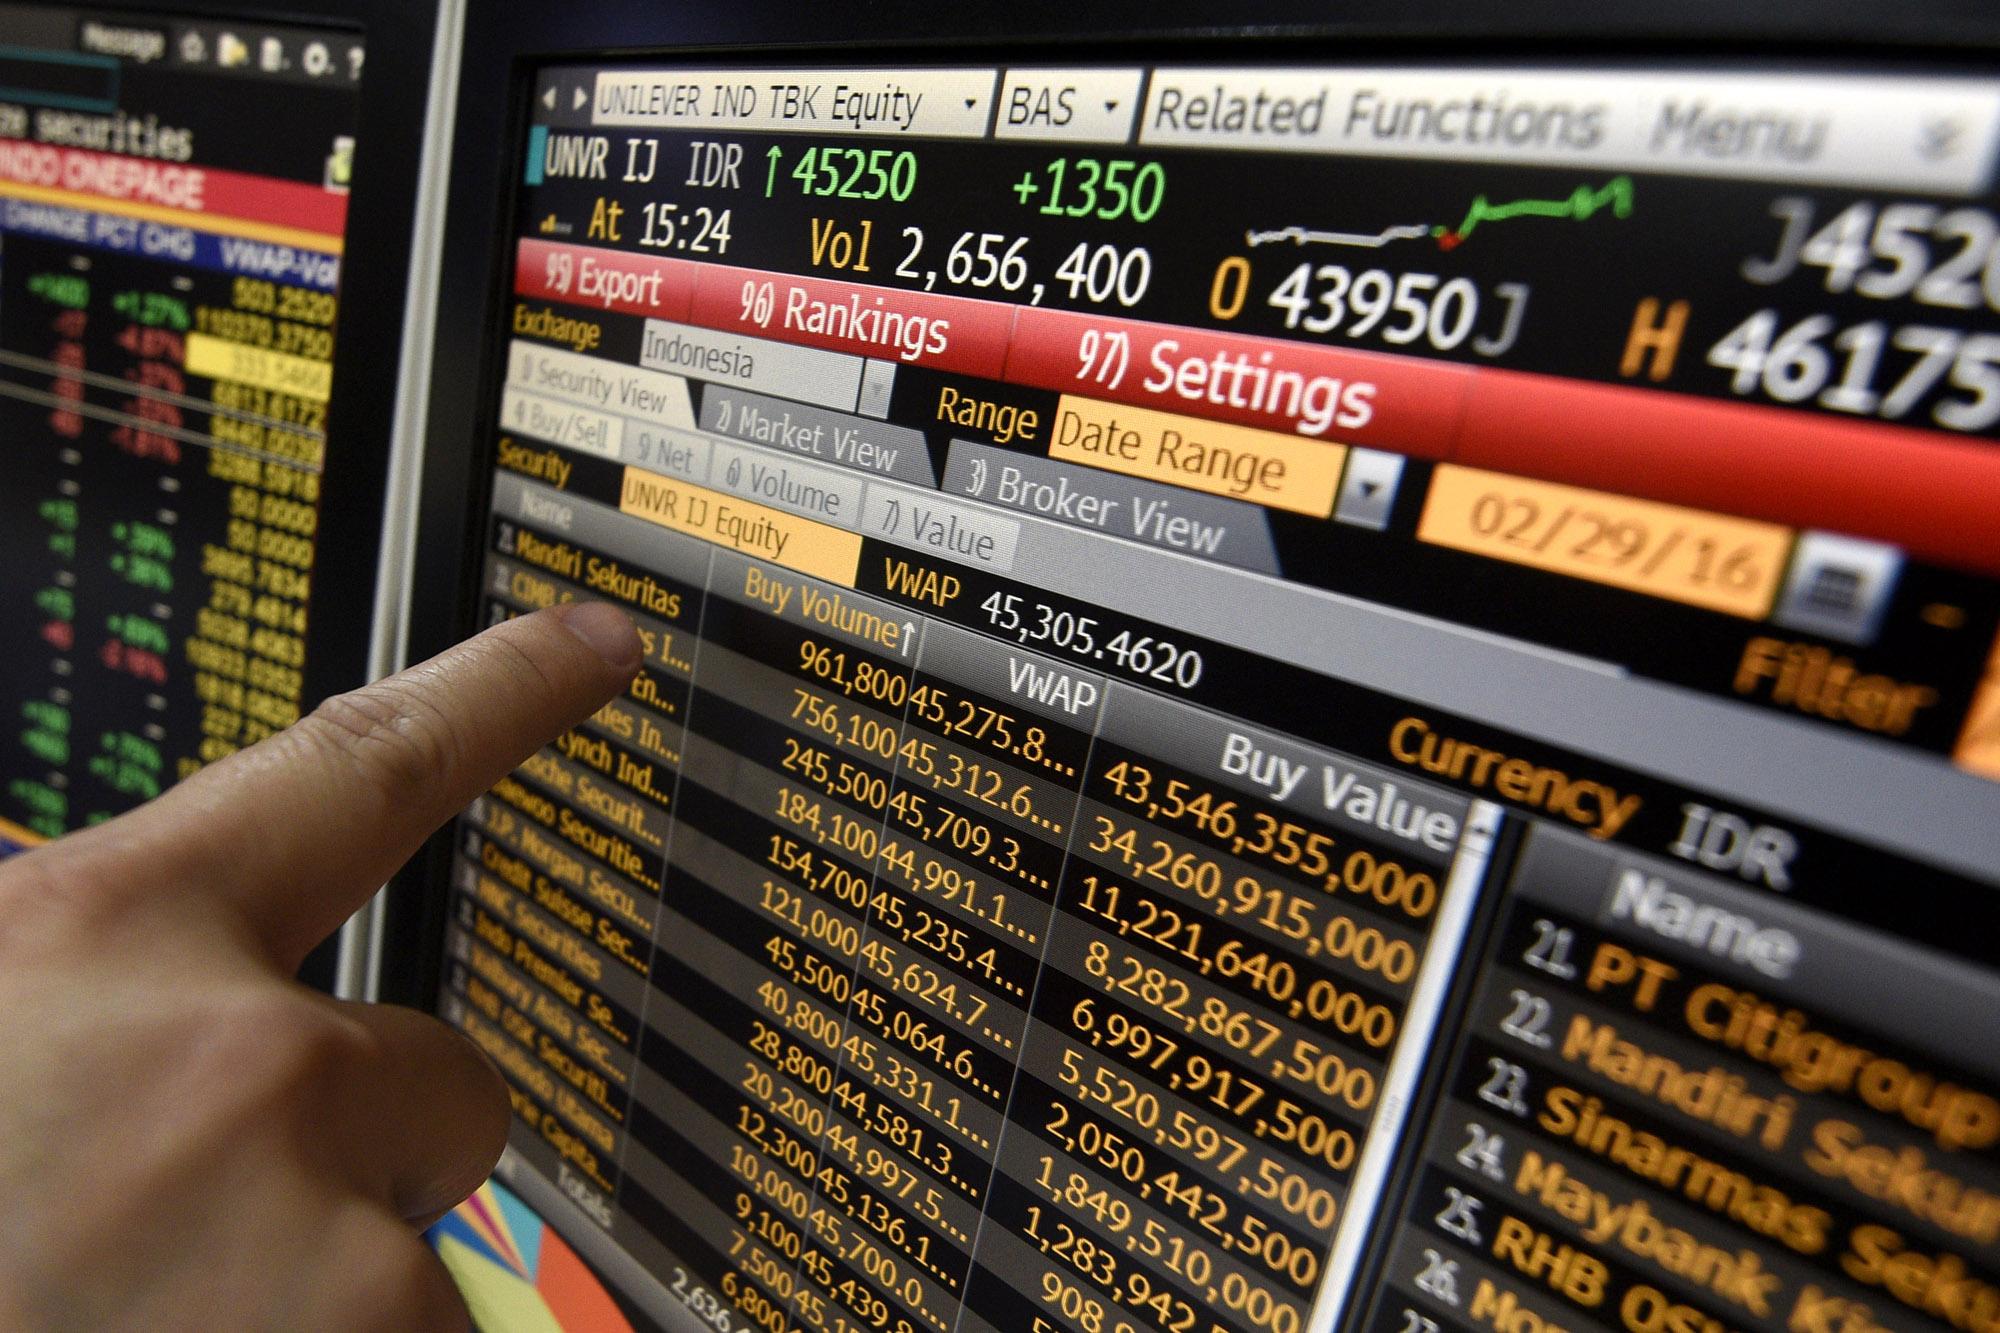 LMAS Juni 2020, Limas Bukukan Penjualan Rp53,73 Miliar | Neraca.co.id